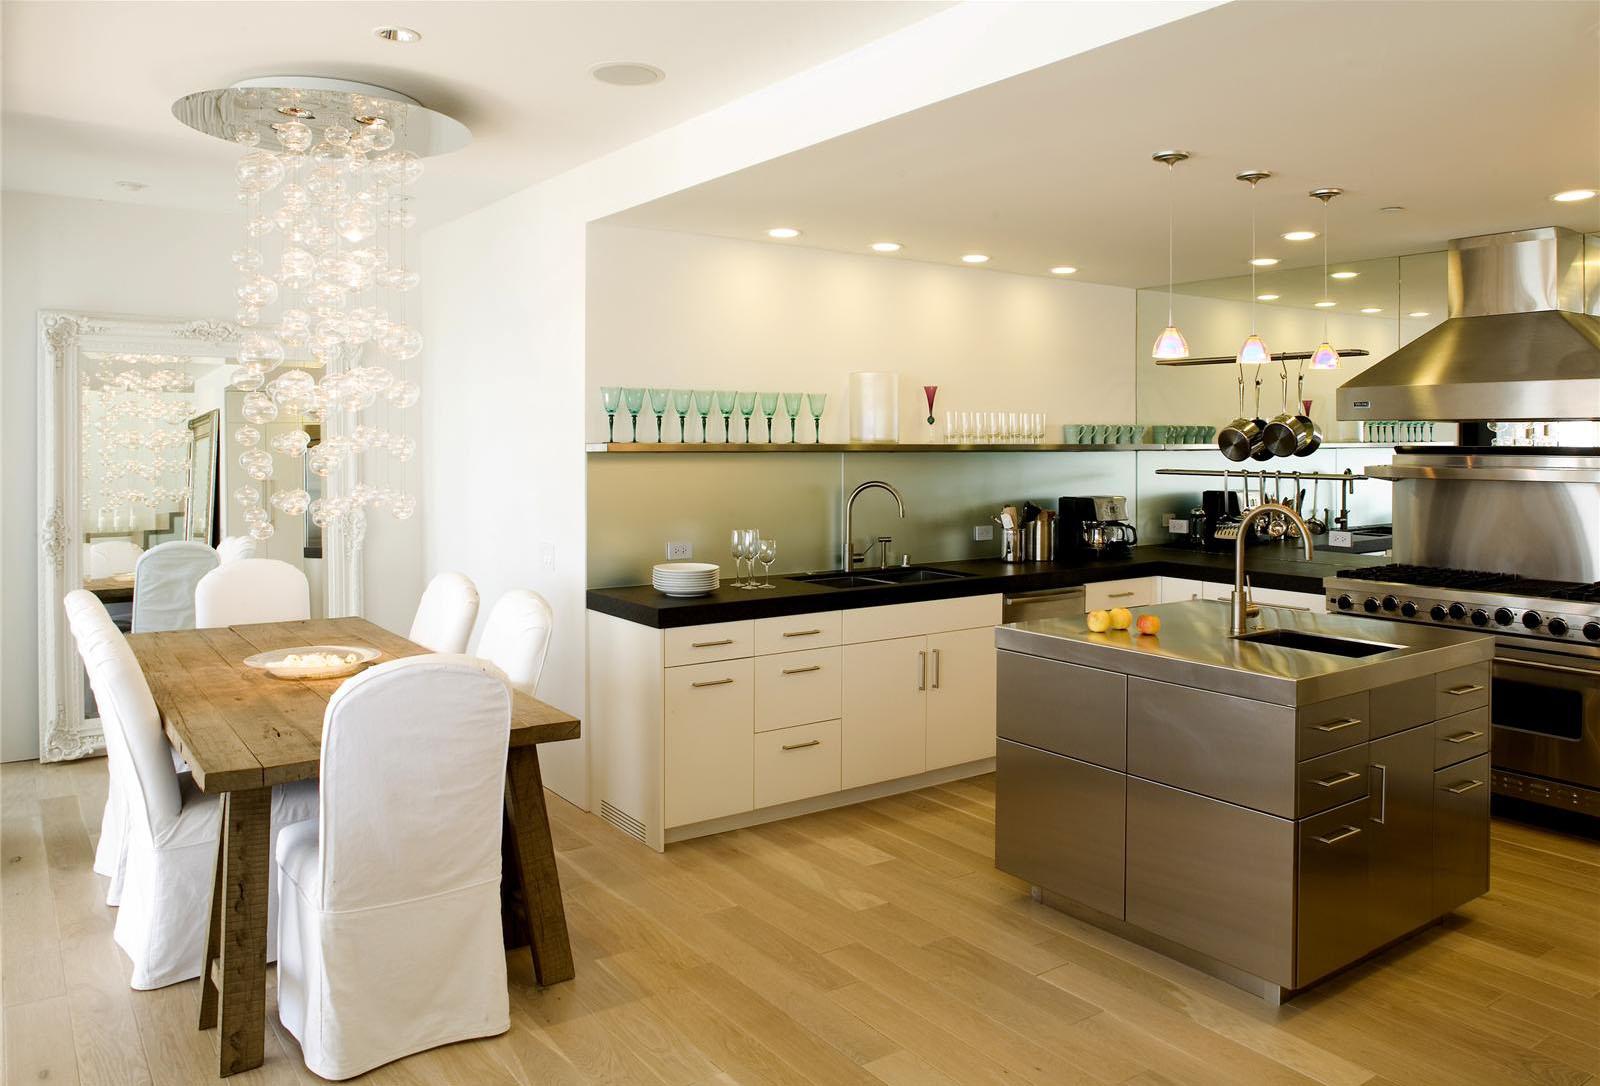 open contemporary kitchen design ideas open kitchen design Via Homeportfolio